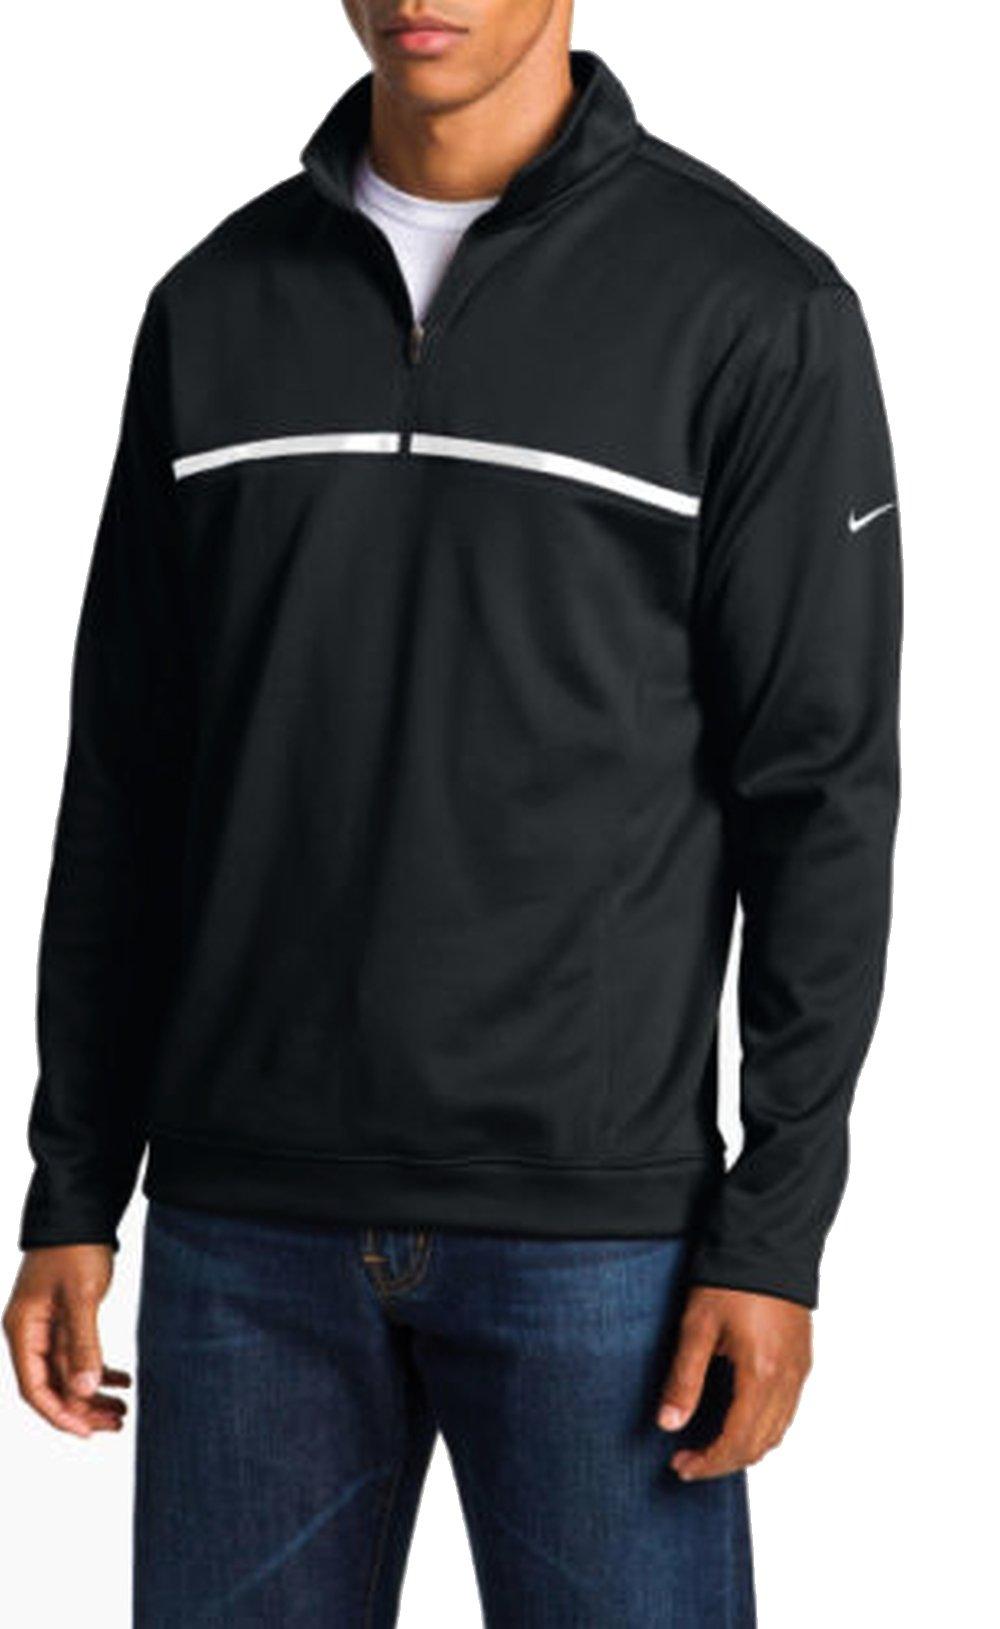 Nike Golf Men's Therma Fit Quarter Zip Pullover Black White XL